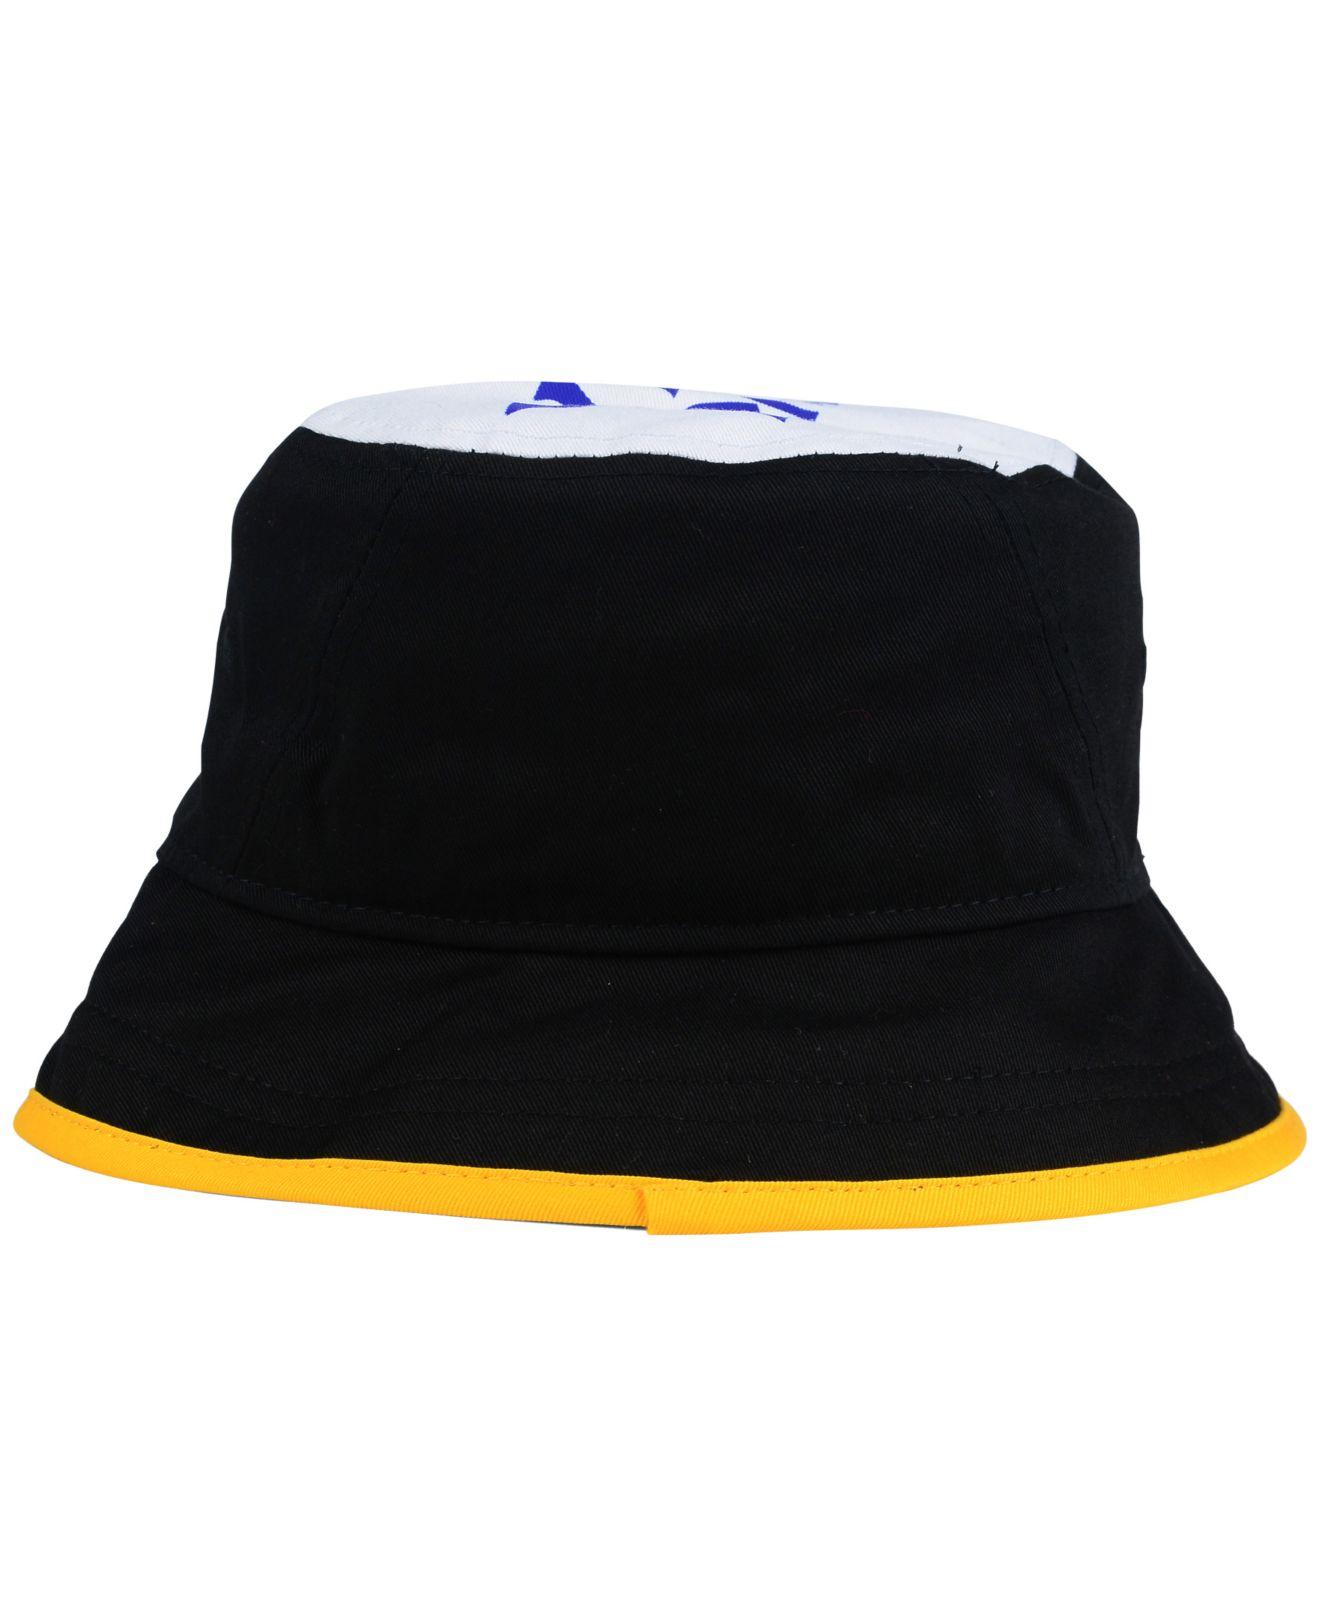 Lyst - KTZ Pittsburgh Steelers Traveler Bucket Hat in Black for Men ebe242d26